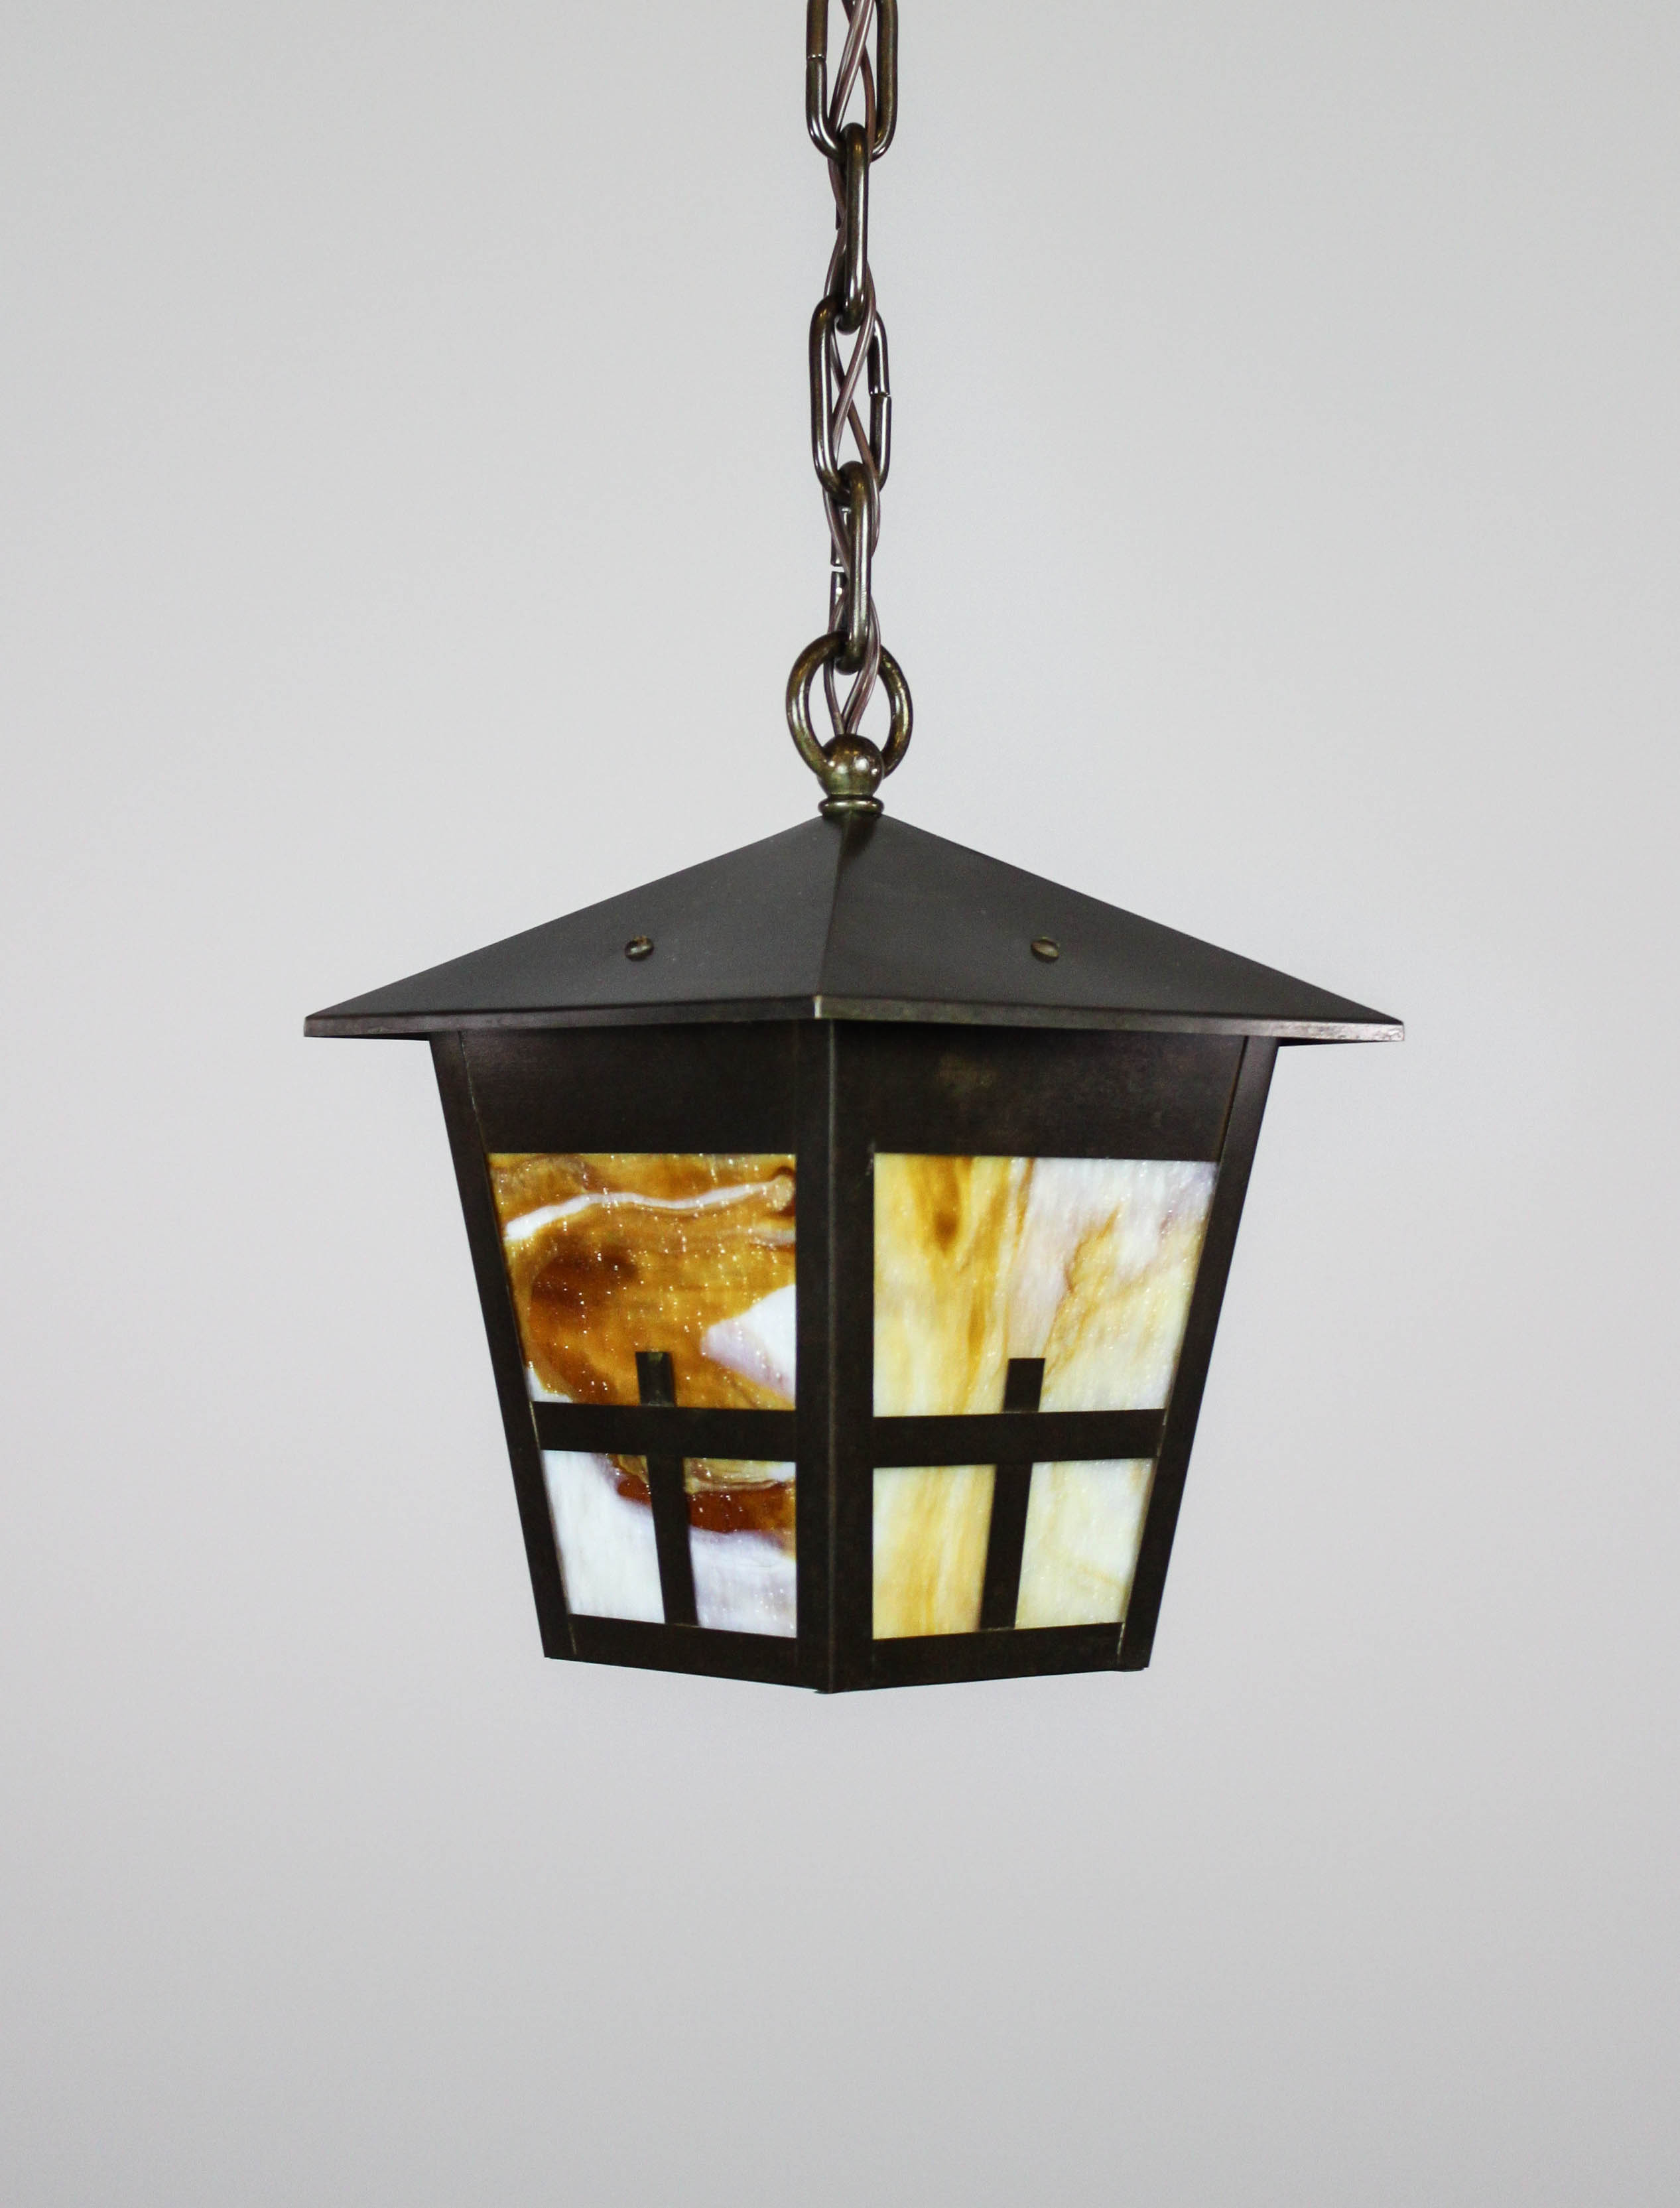 arts crafts mission lantern pendant fixture renew gallery. Black Bedroom Furniture Sets. Home Design Ideas